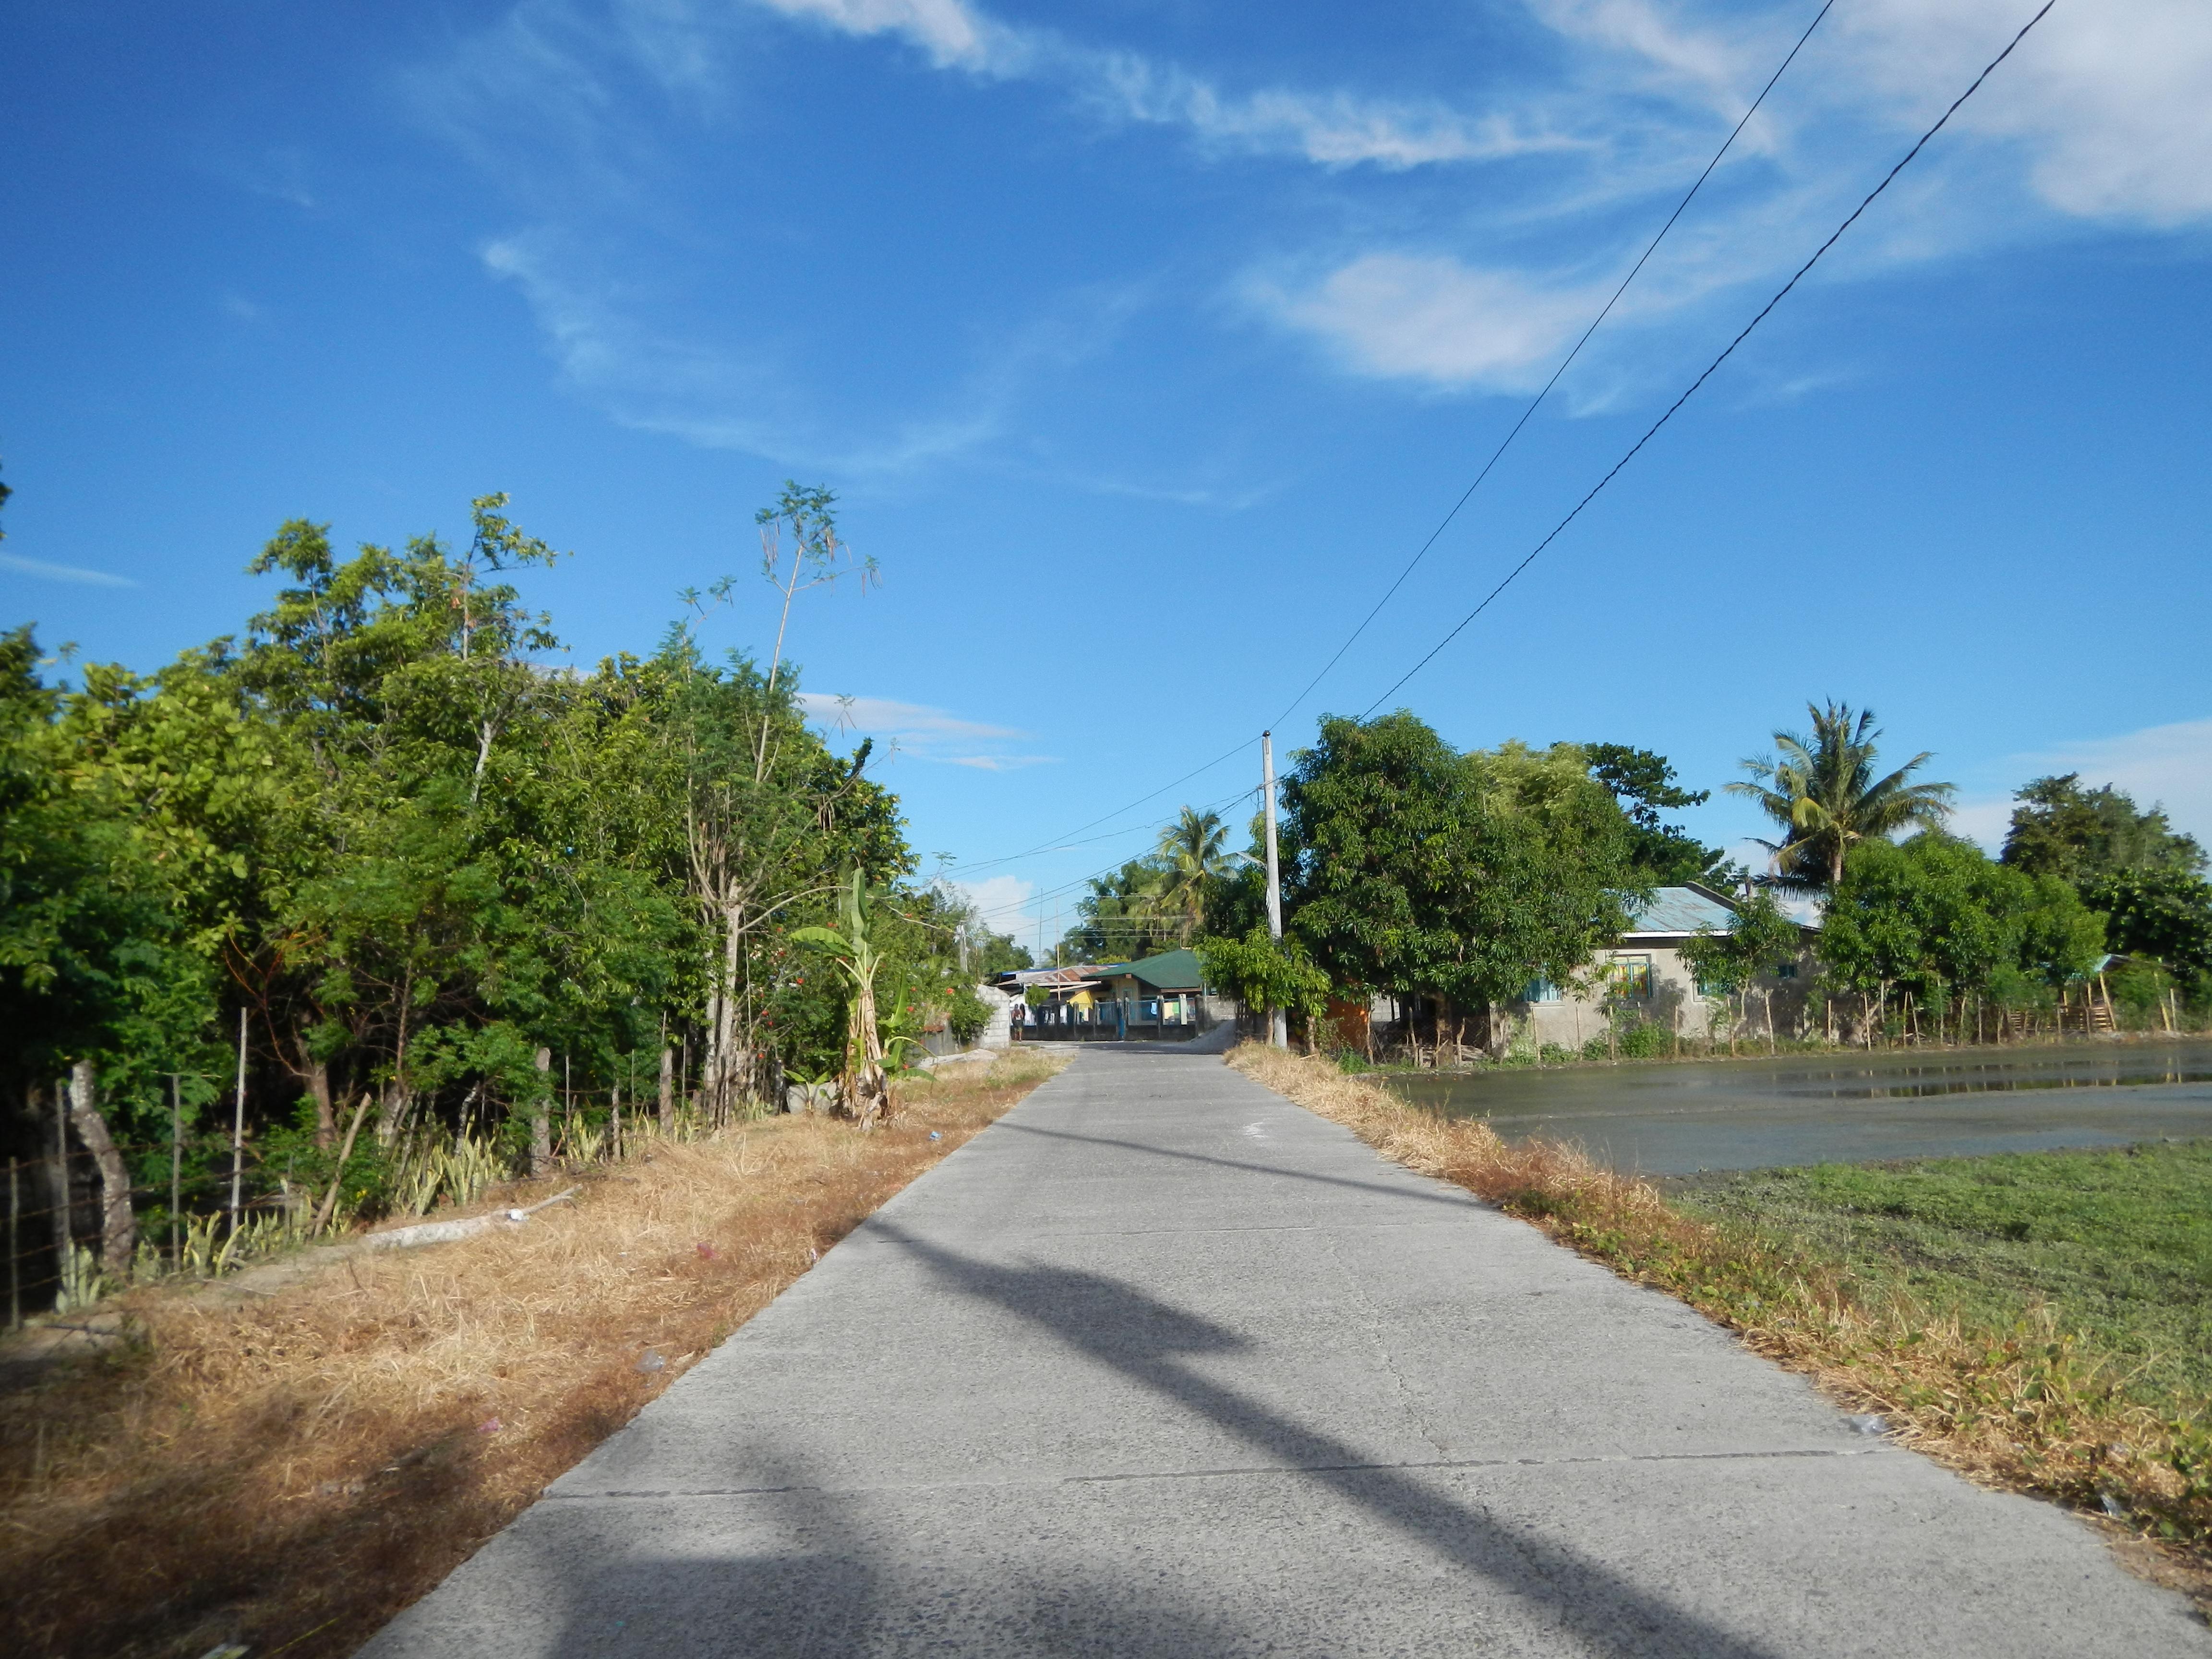 File:7605jfRizal Balanoy La Paz Hall Roads Tarlacfvf 23 ...